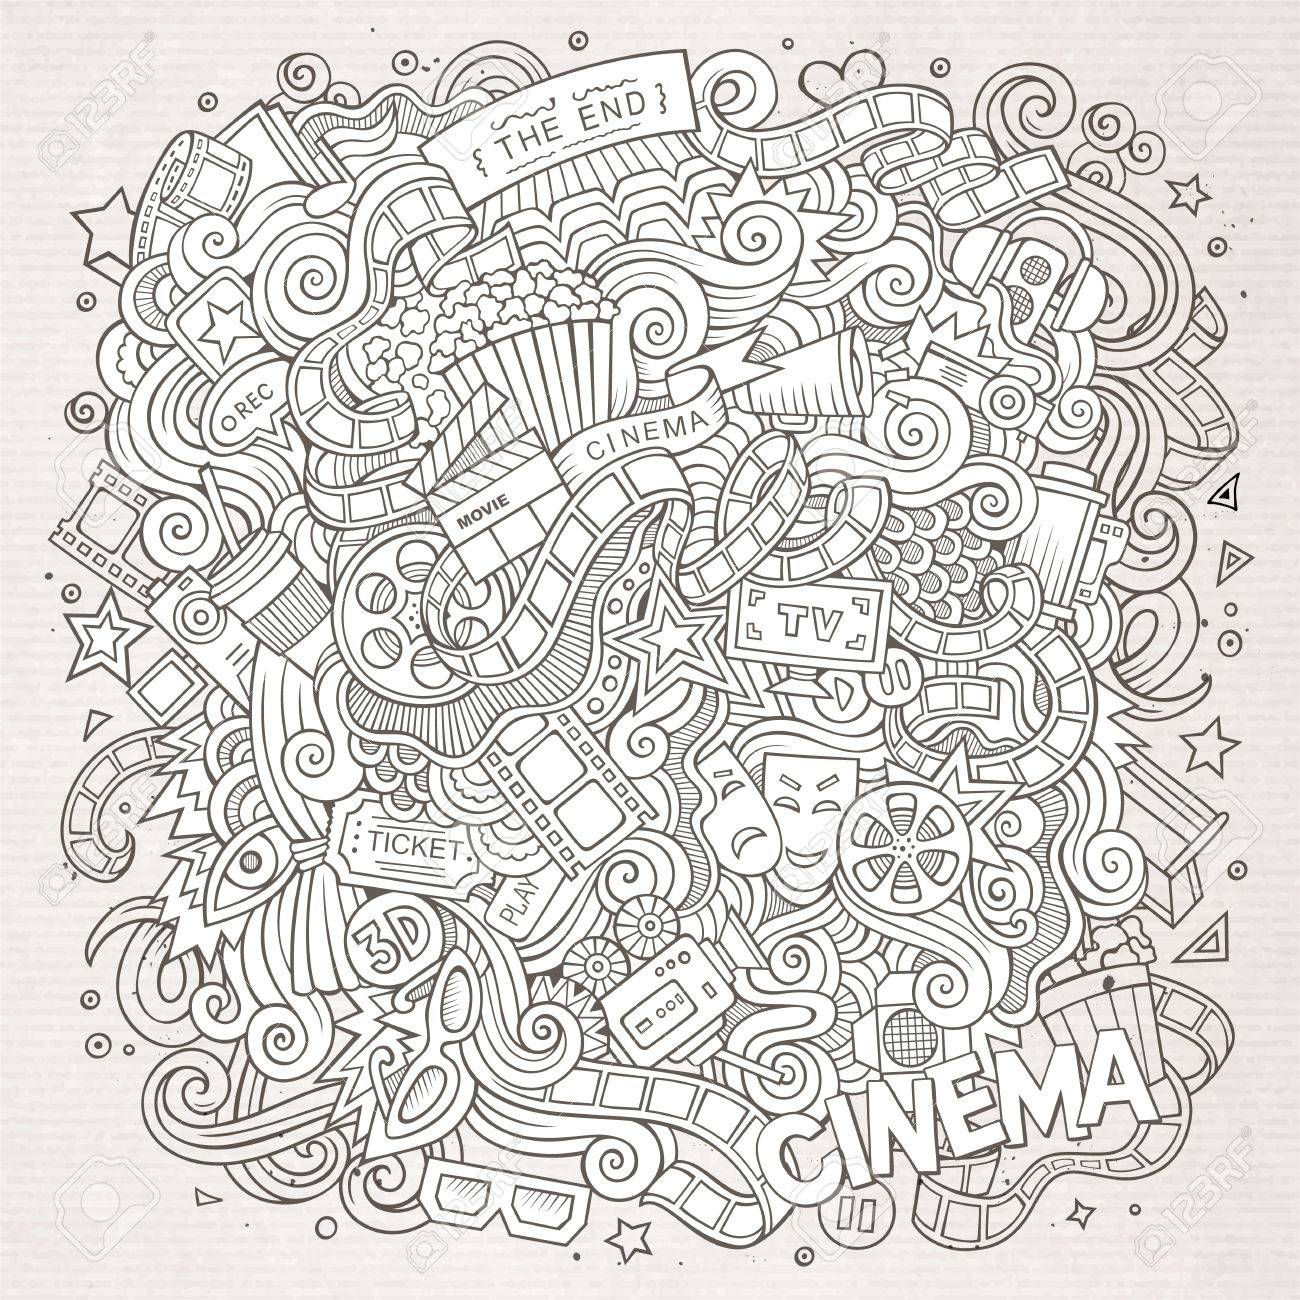 Dessin Anime Mignon Doodles Design De Cadre De Cinema Dessine A La